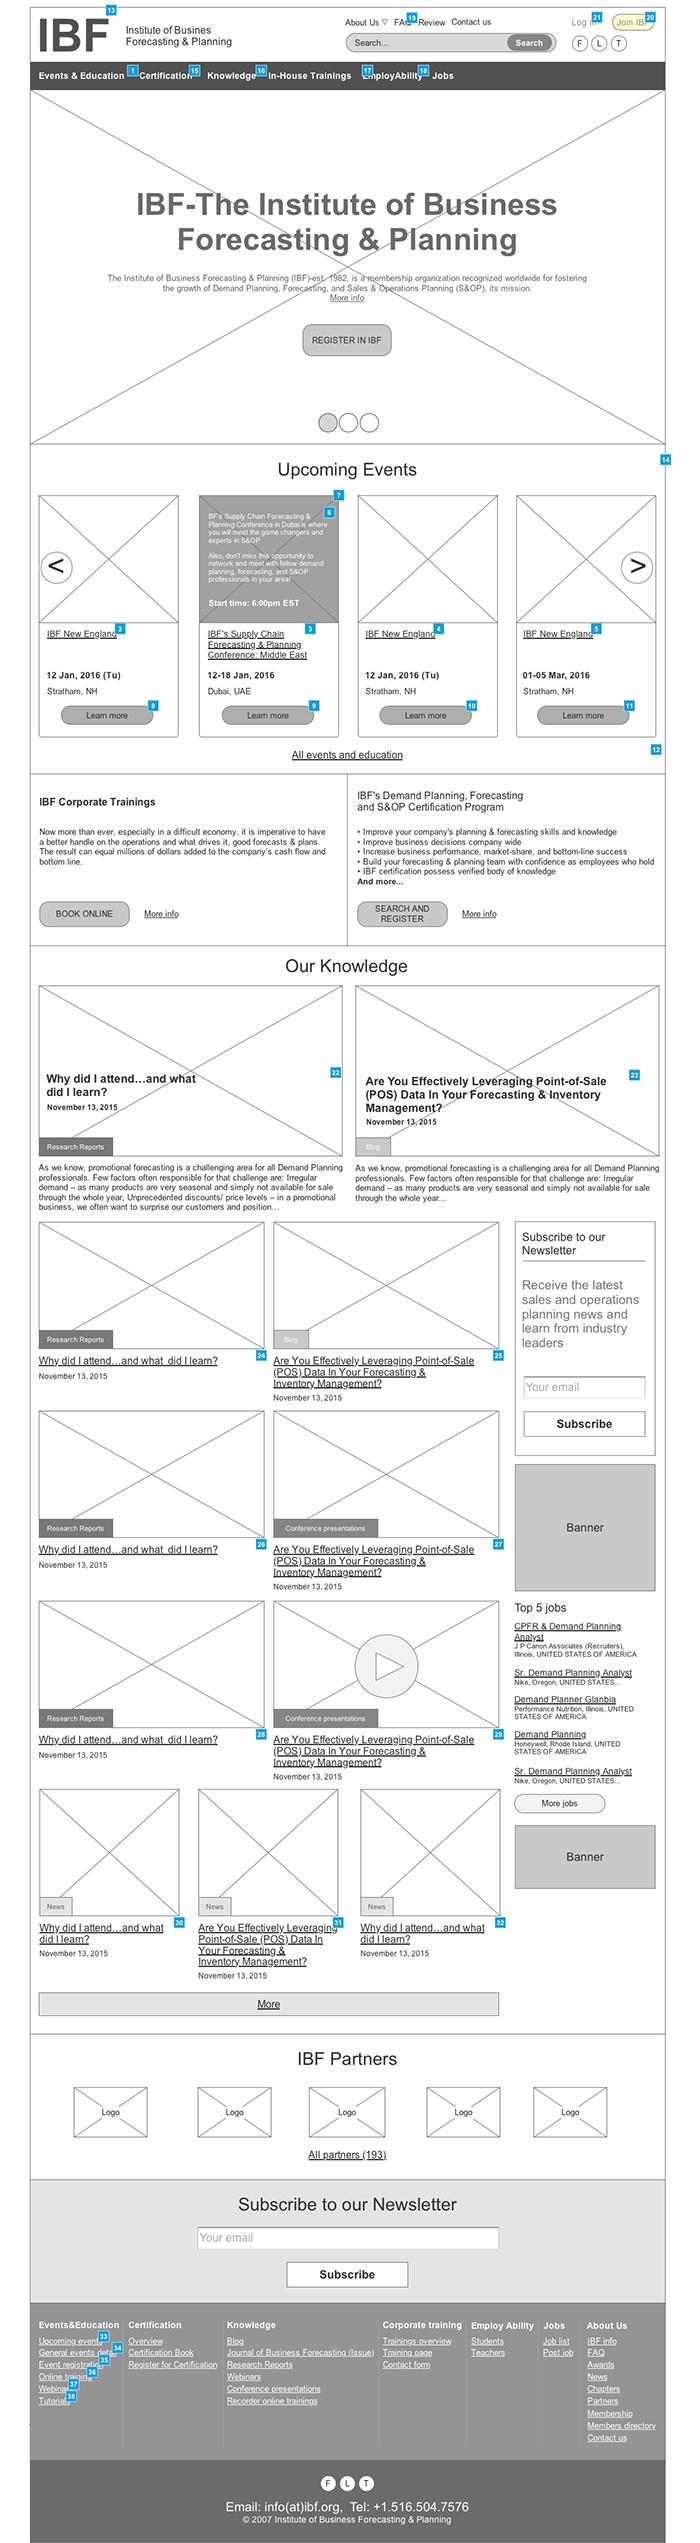 IBF - Institute of Busines Forecasting & Planning (20+ страниц)